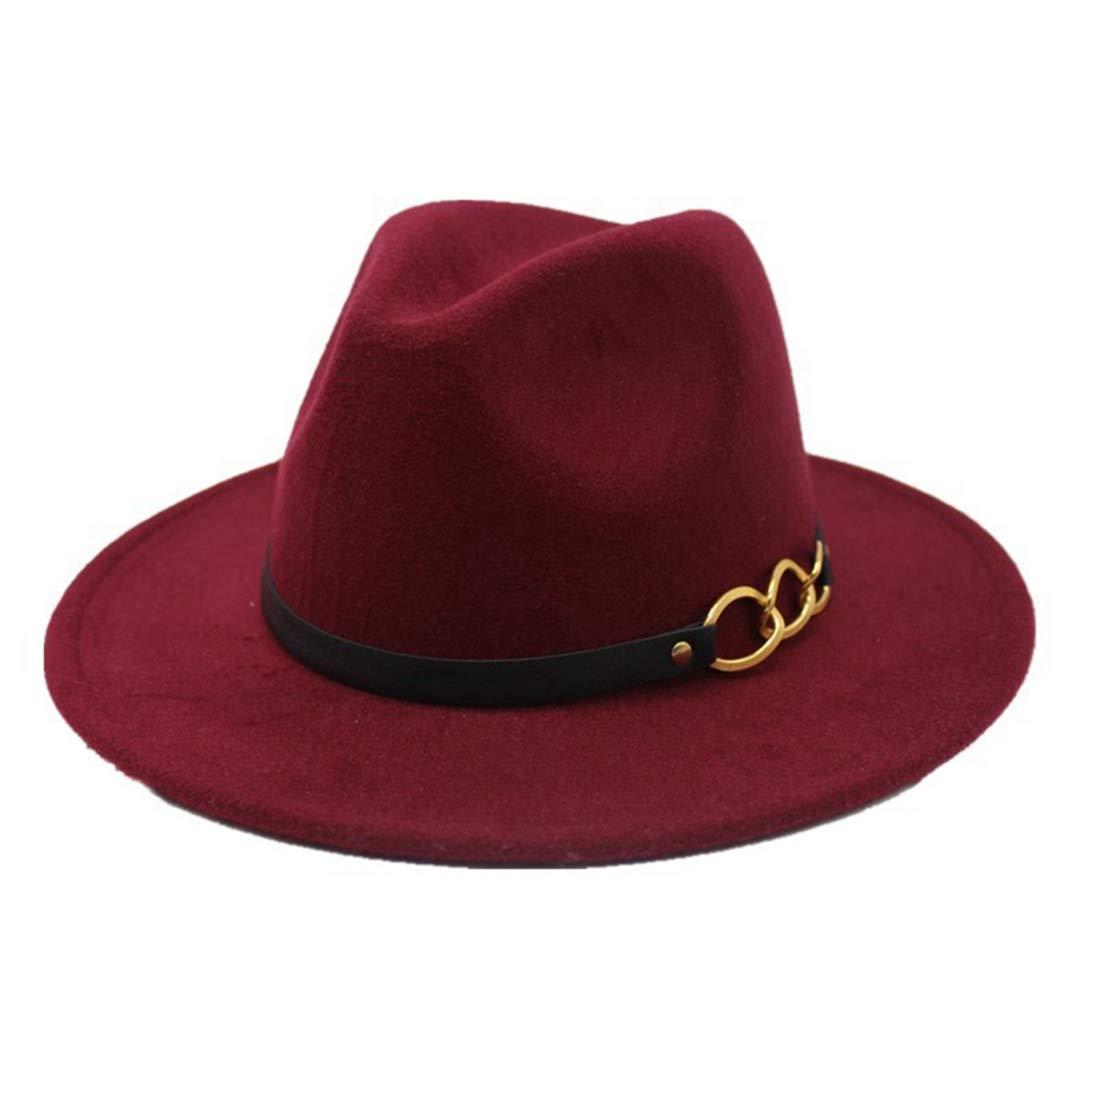 Fedora Hats Classic Vintage Wool Felt Hat Winter Vintage Wide Brim Jazz Cap Bowler Hats for Men Women